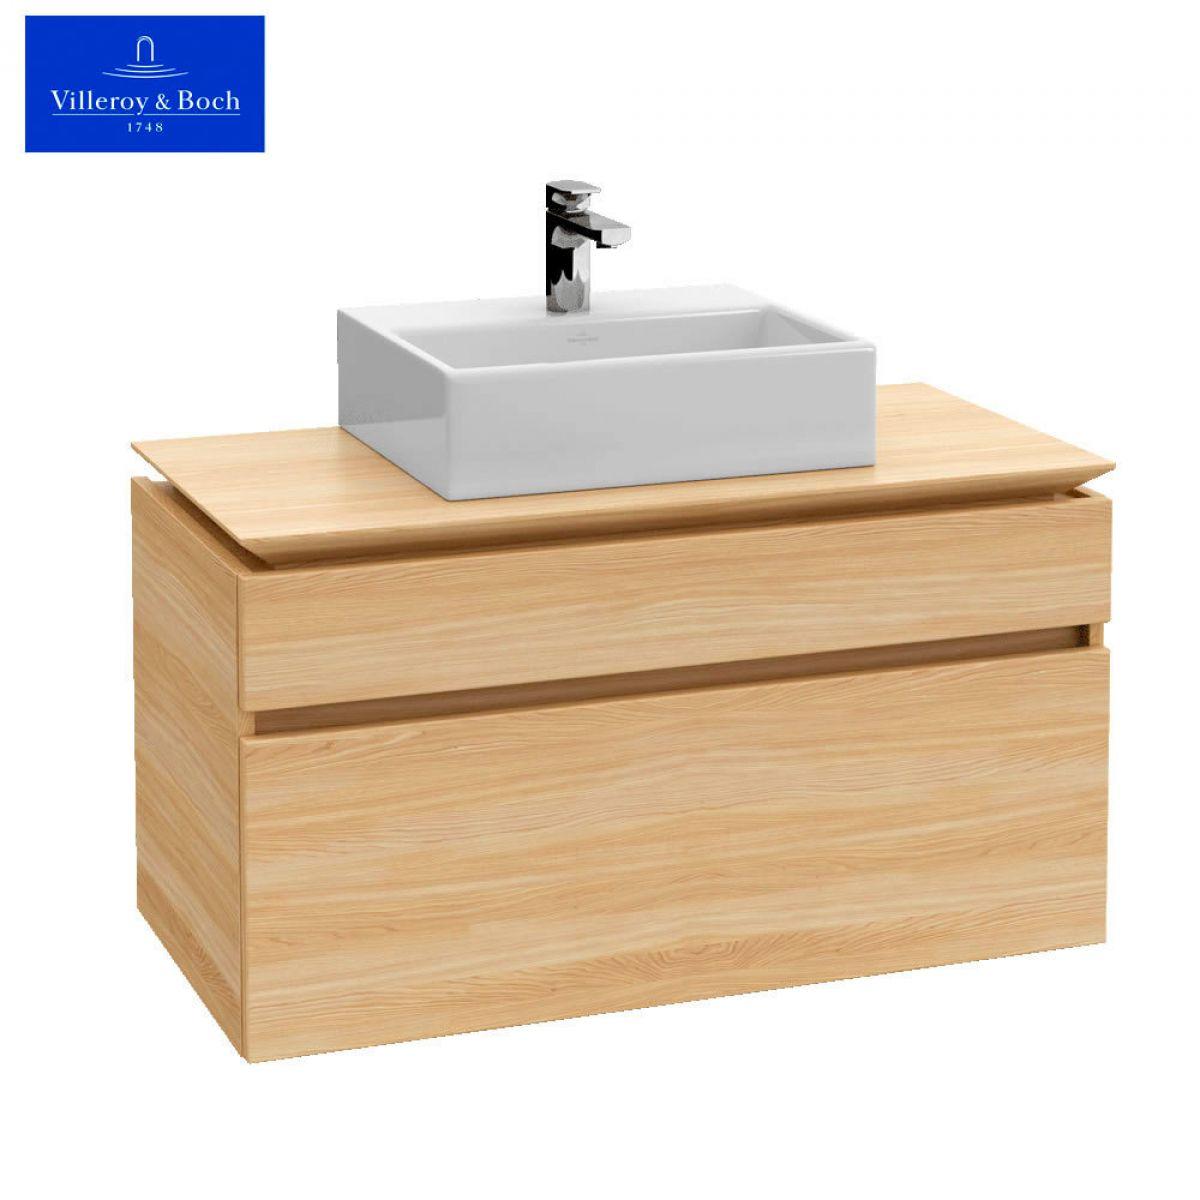 Villeroy boch legato 800mm vanity unit for memento - Villeroy y boch ...